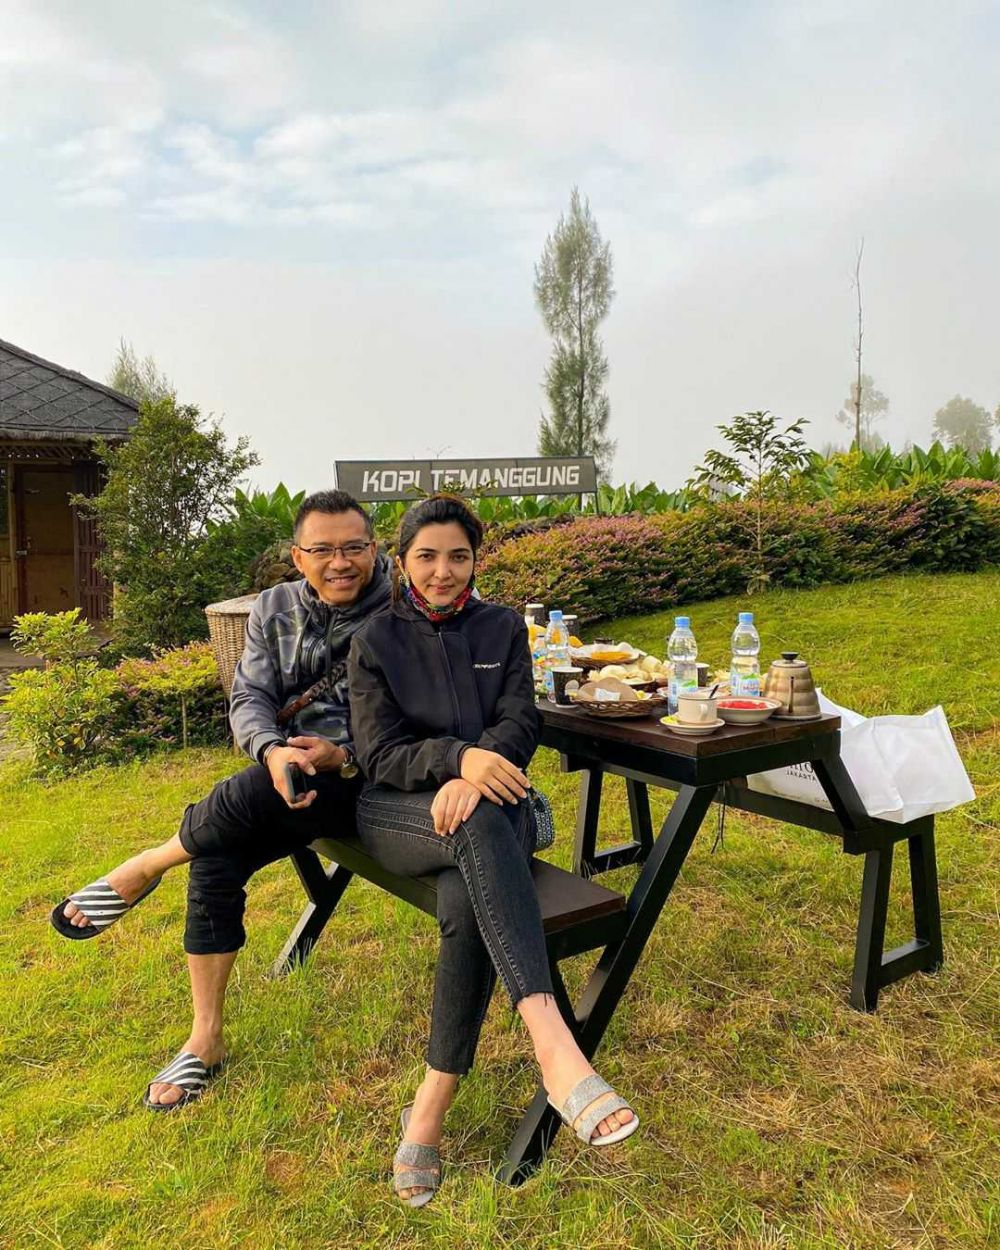 9 Potret Keseruan Liburan Ashanty di Jawa Tengah danYogyakarta